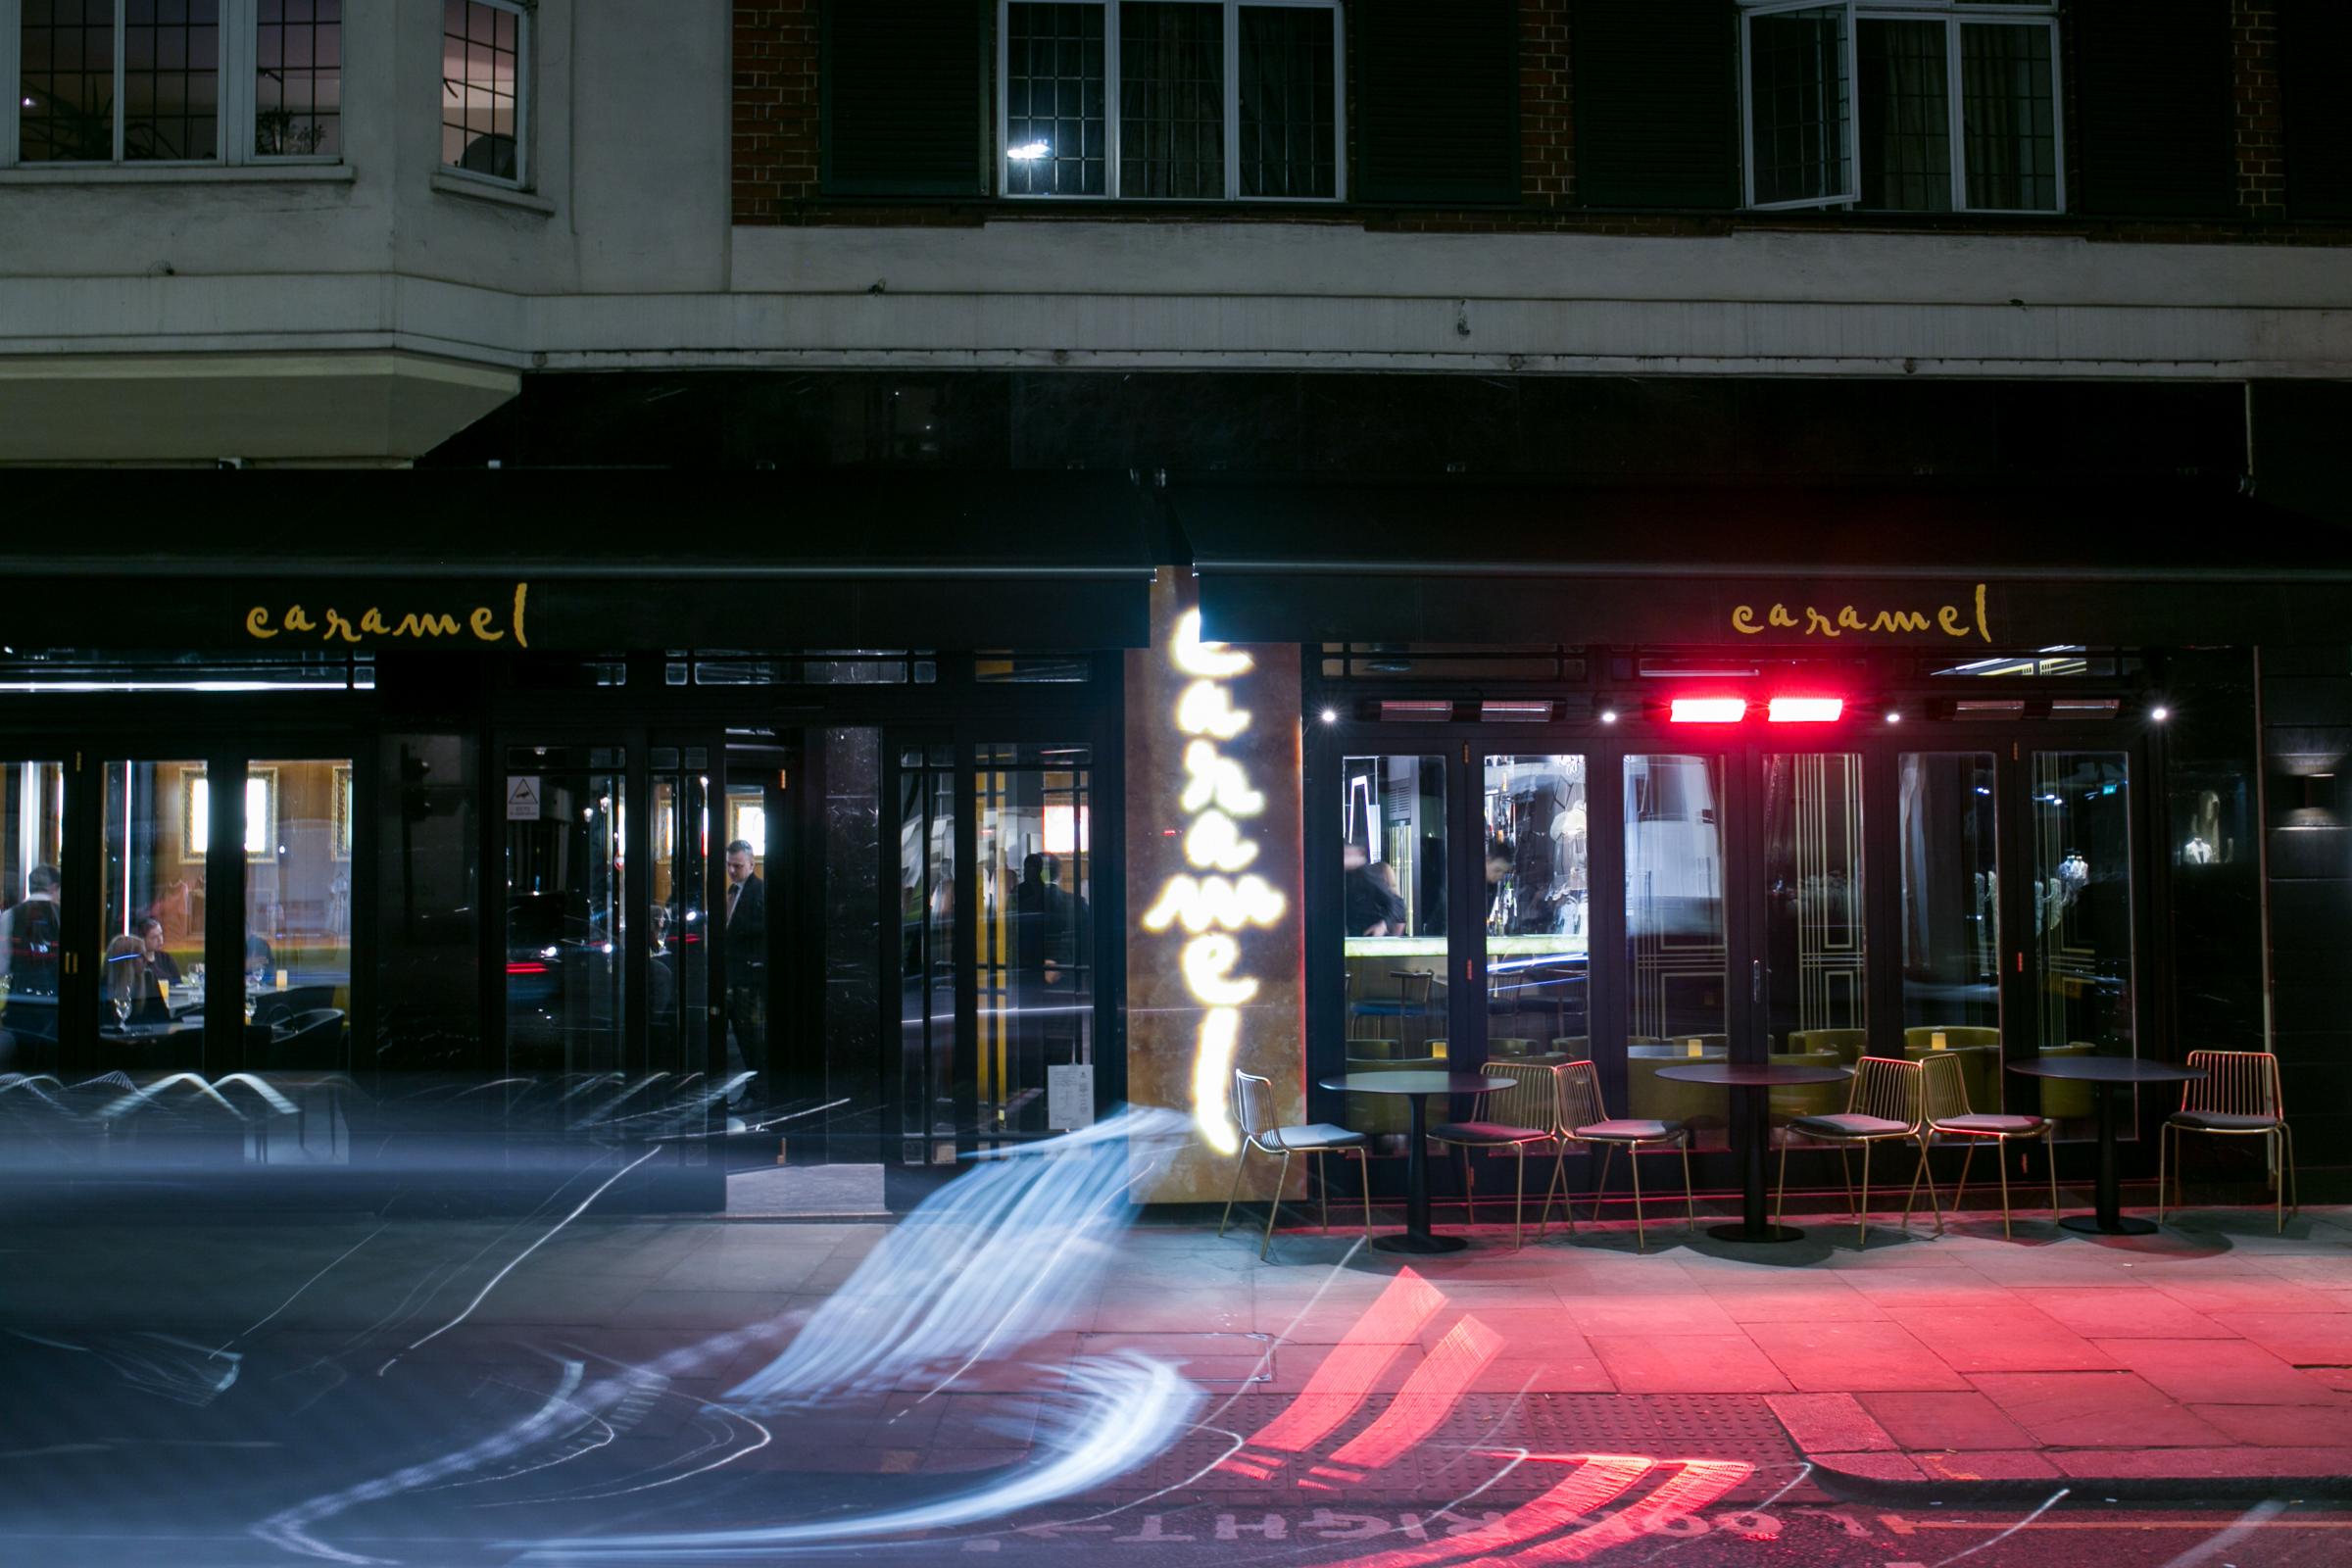 Caramel-restaurant-and-lounge-london-abu-dabi-dubai-oman-new-restaurant-in-london-minas-planet-review-jasmina-haskovic25.jpg